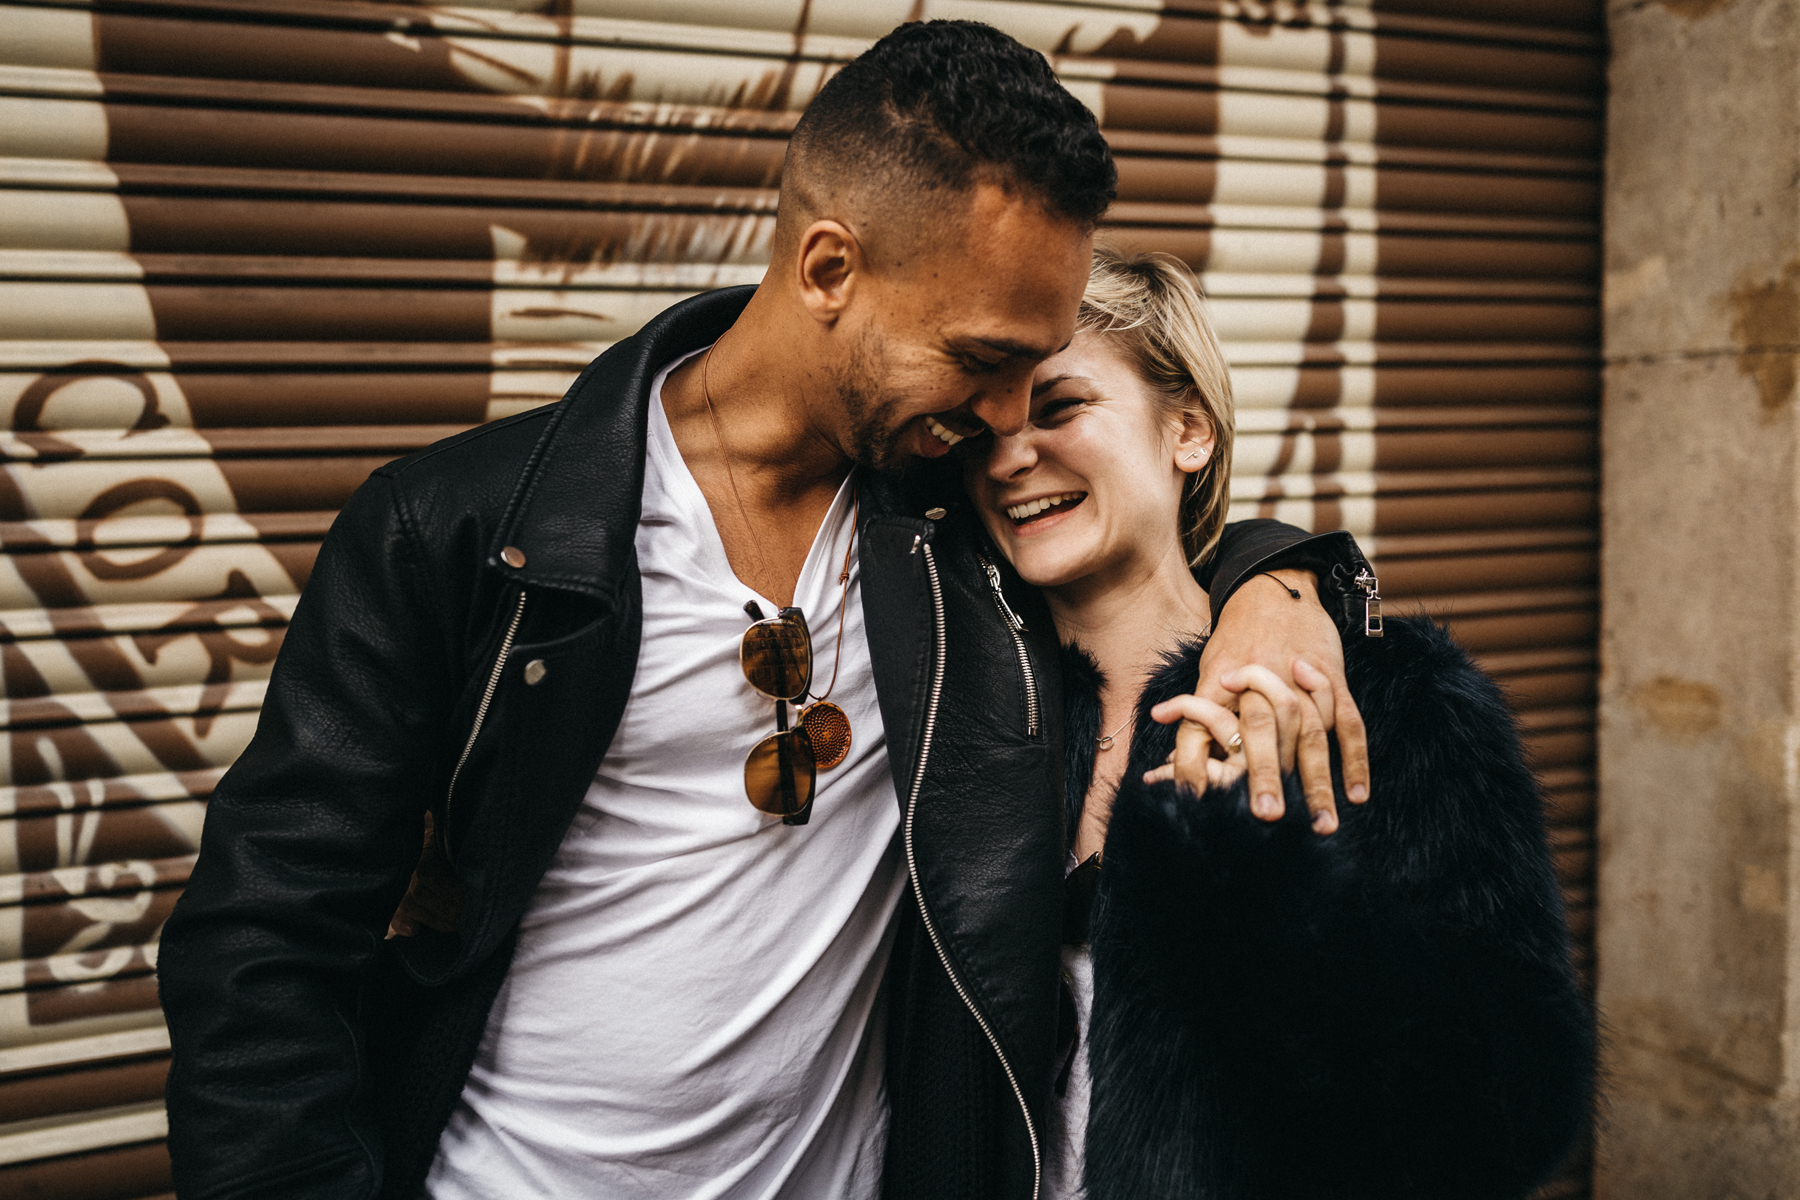 raissa simon fotografie urban coupleshooting barcelona 011 - Wietske + Stefanos